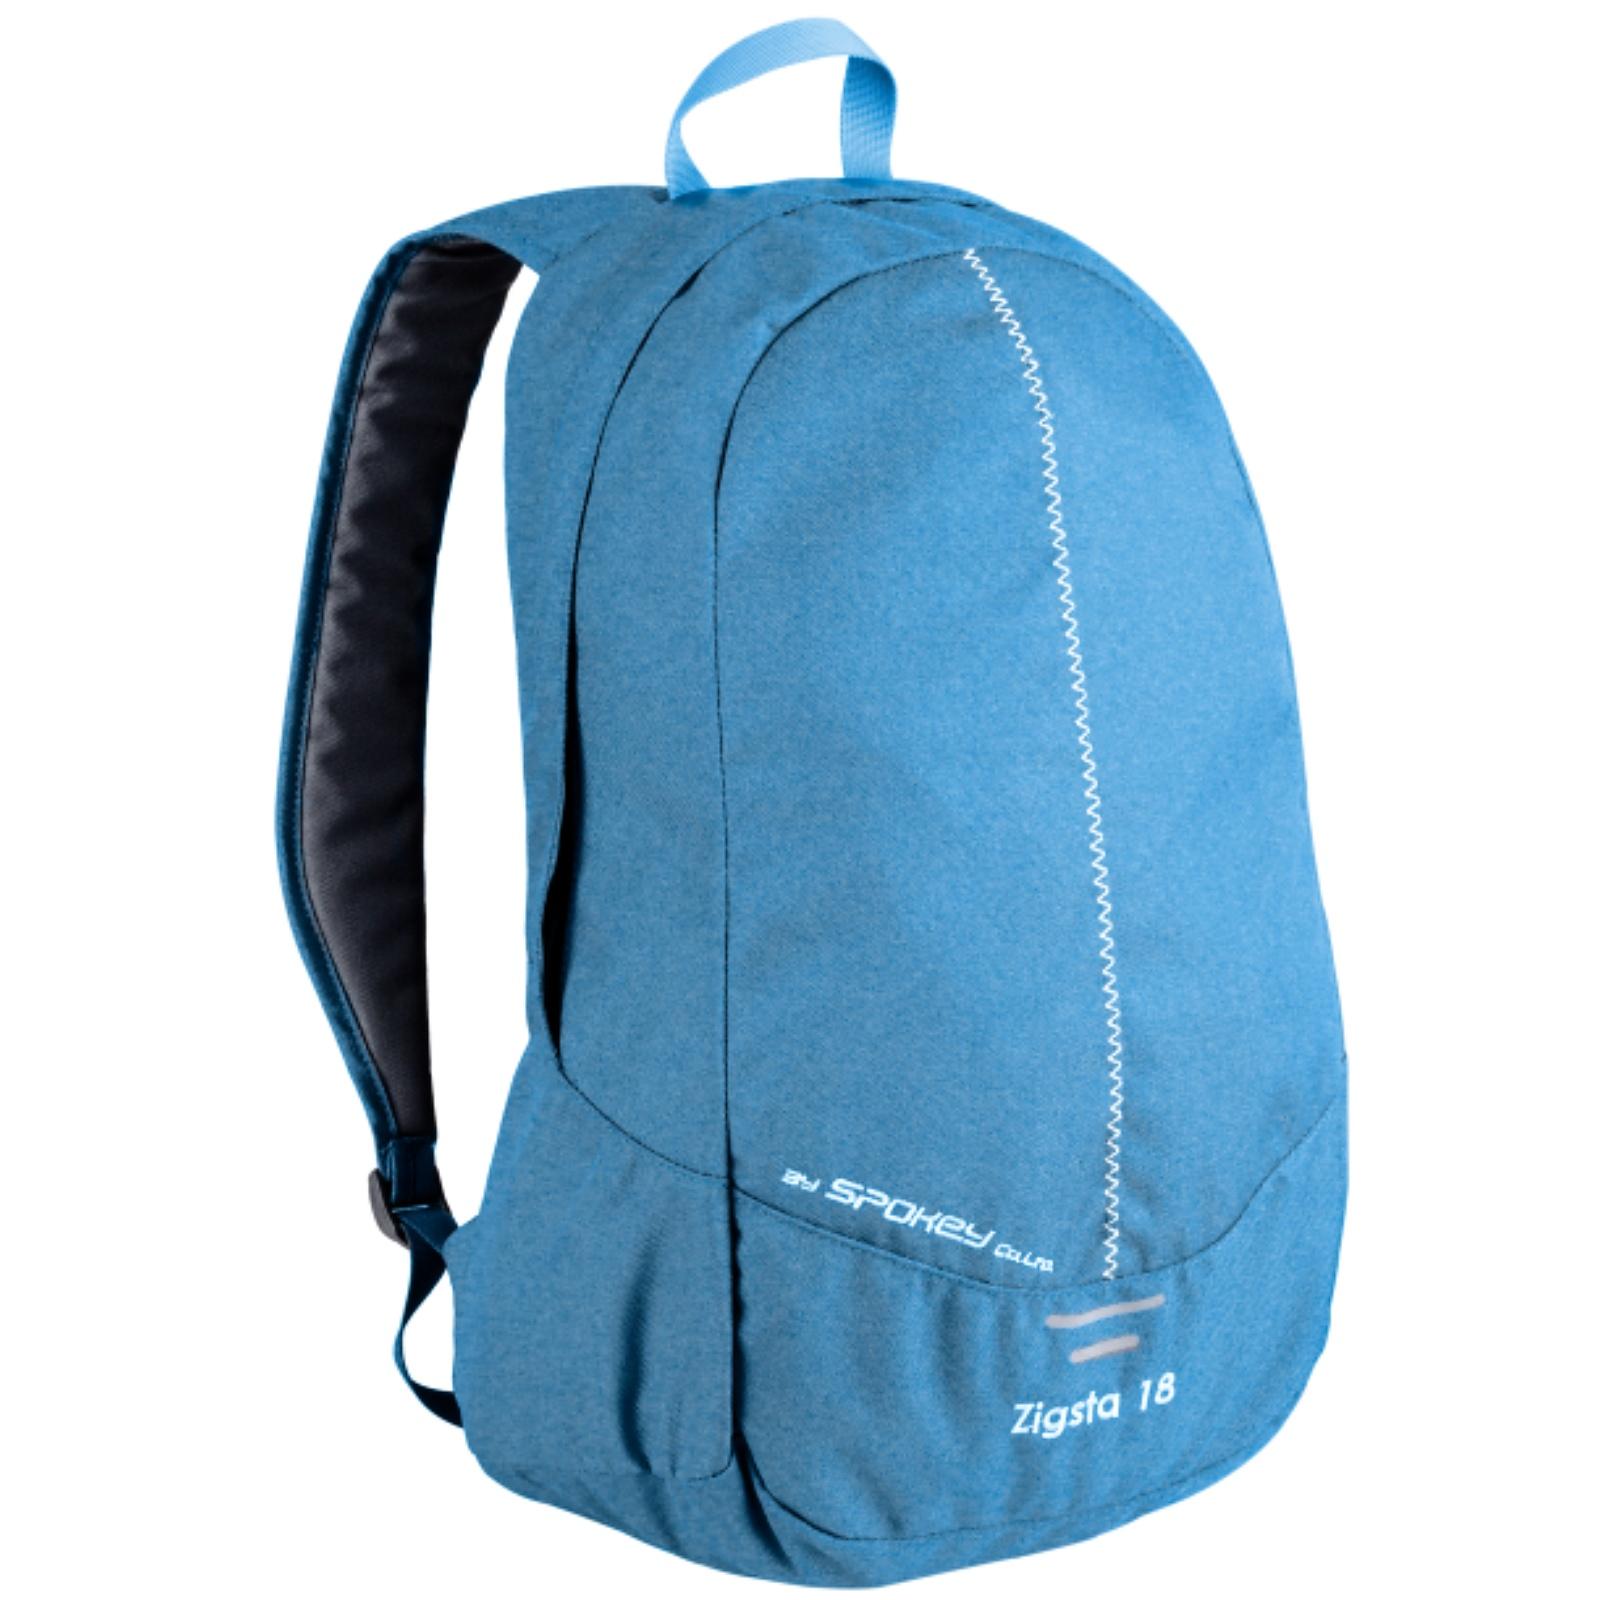 Batoh SPOKEY Zigsta 18L modrý